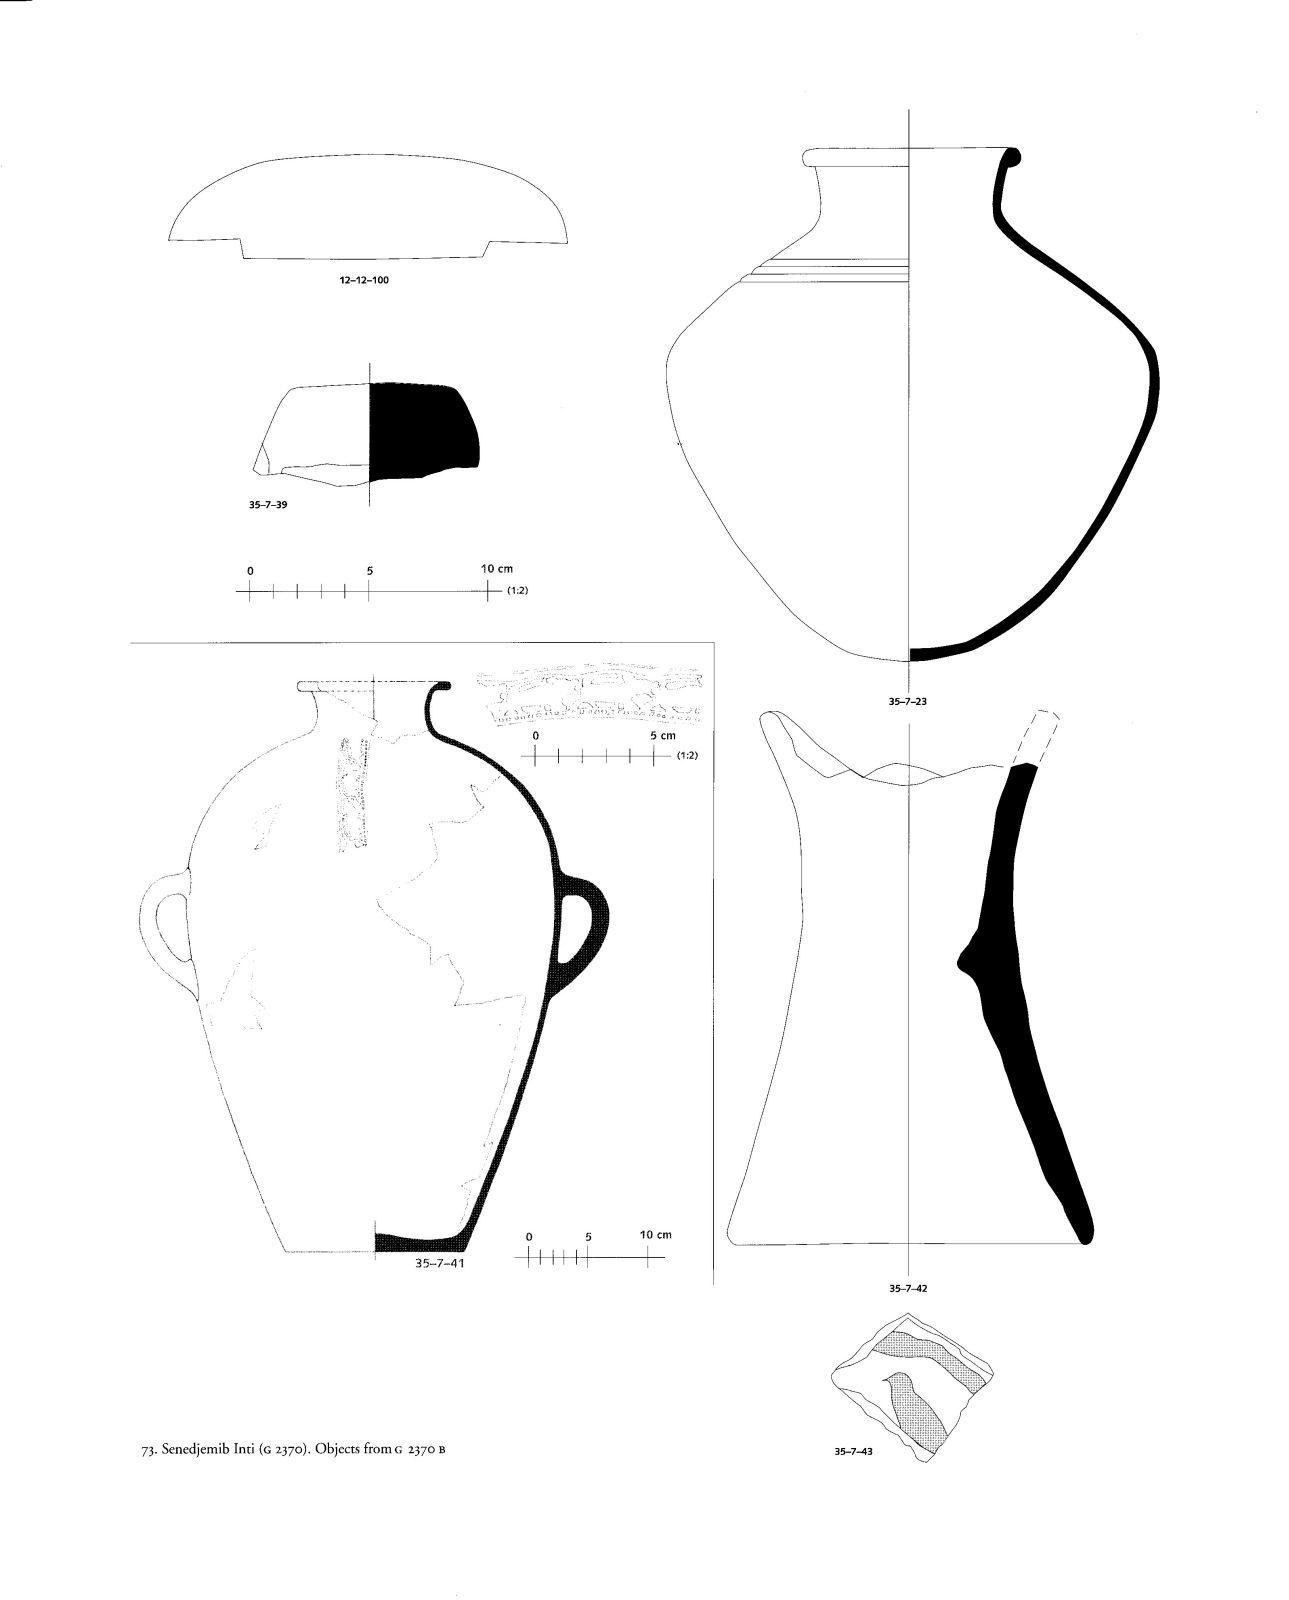 Drawings: G 2370, Shaft B: objects